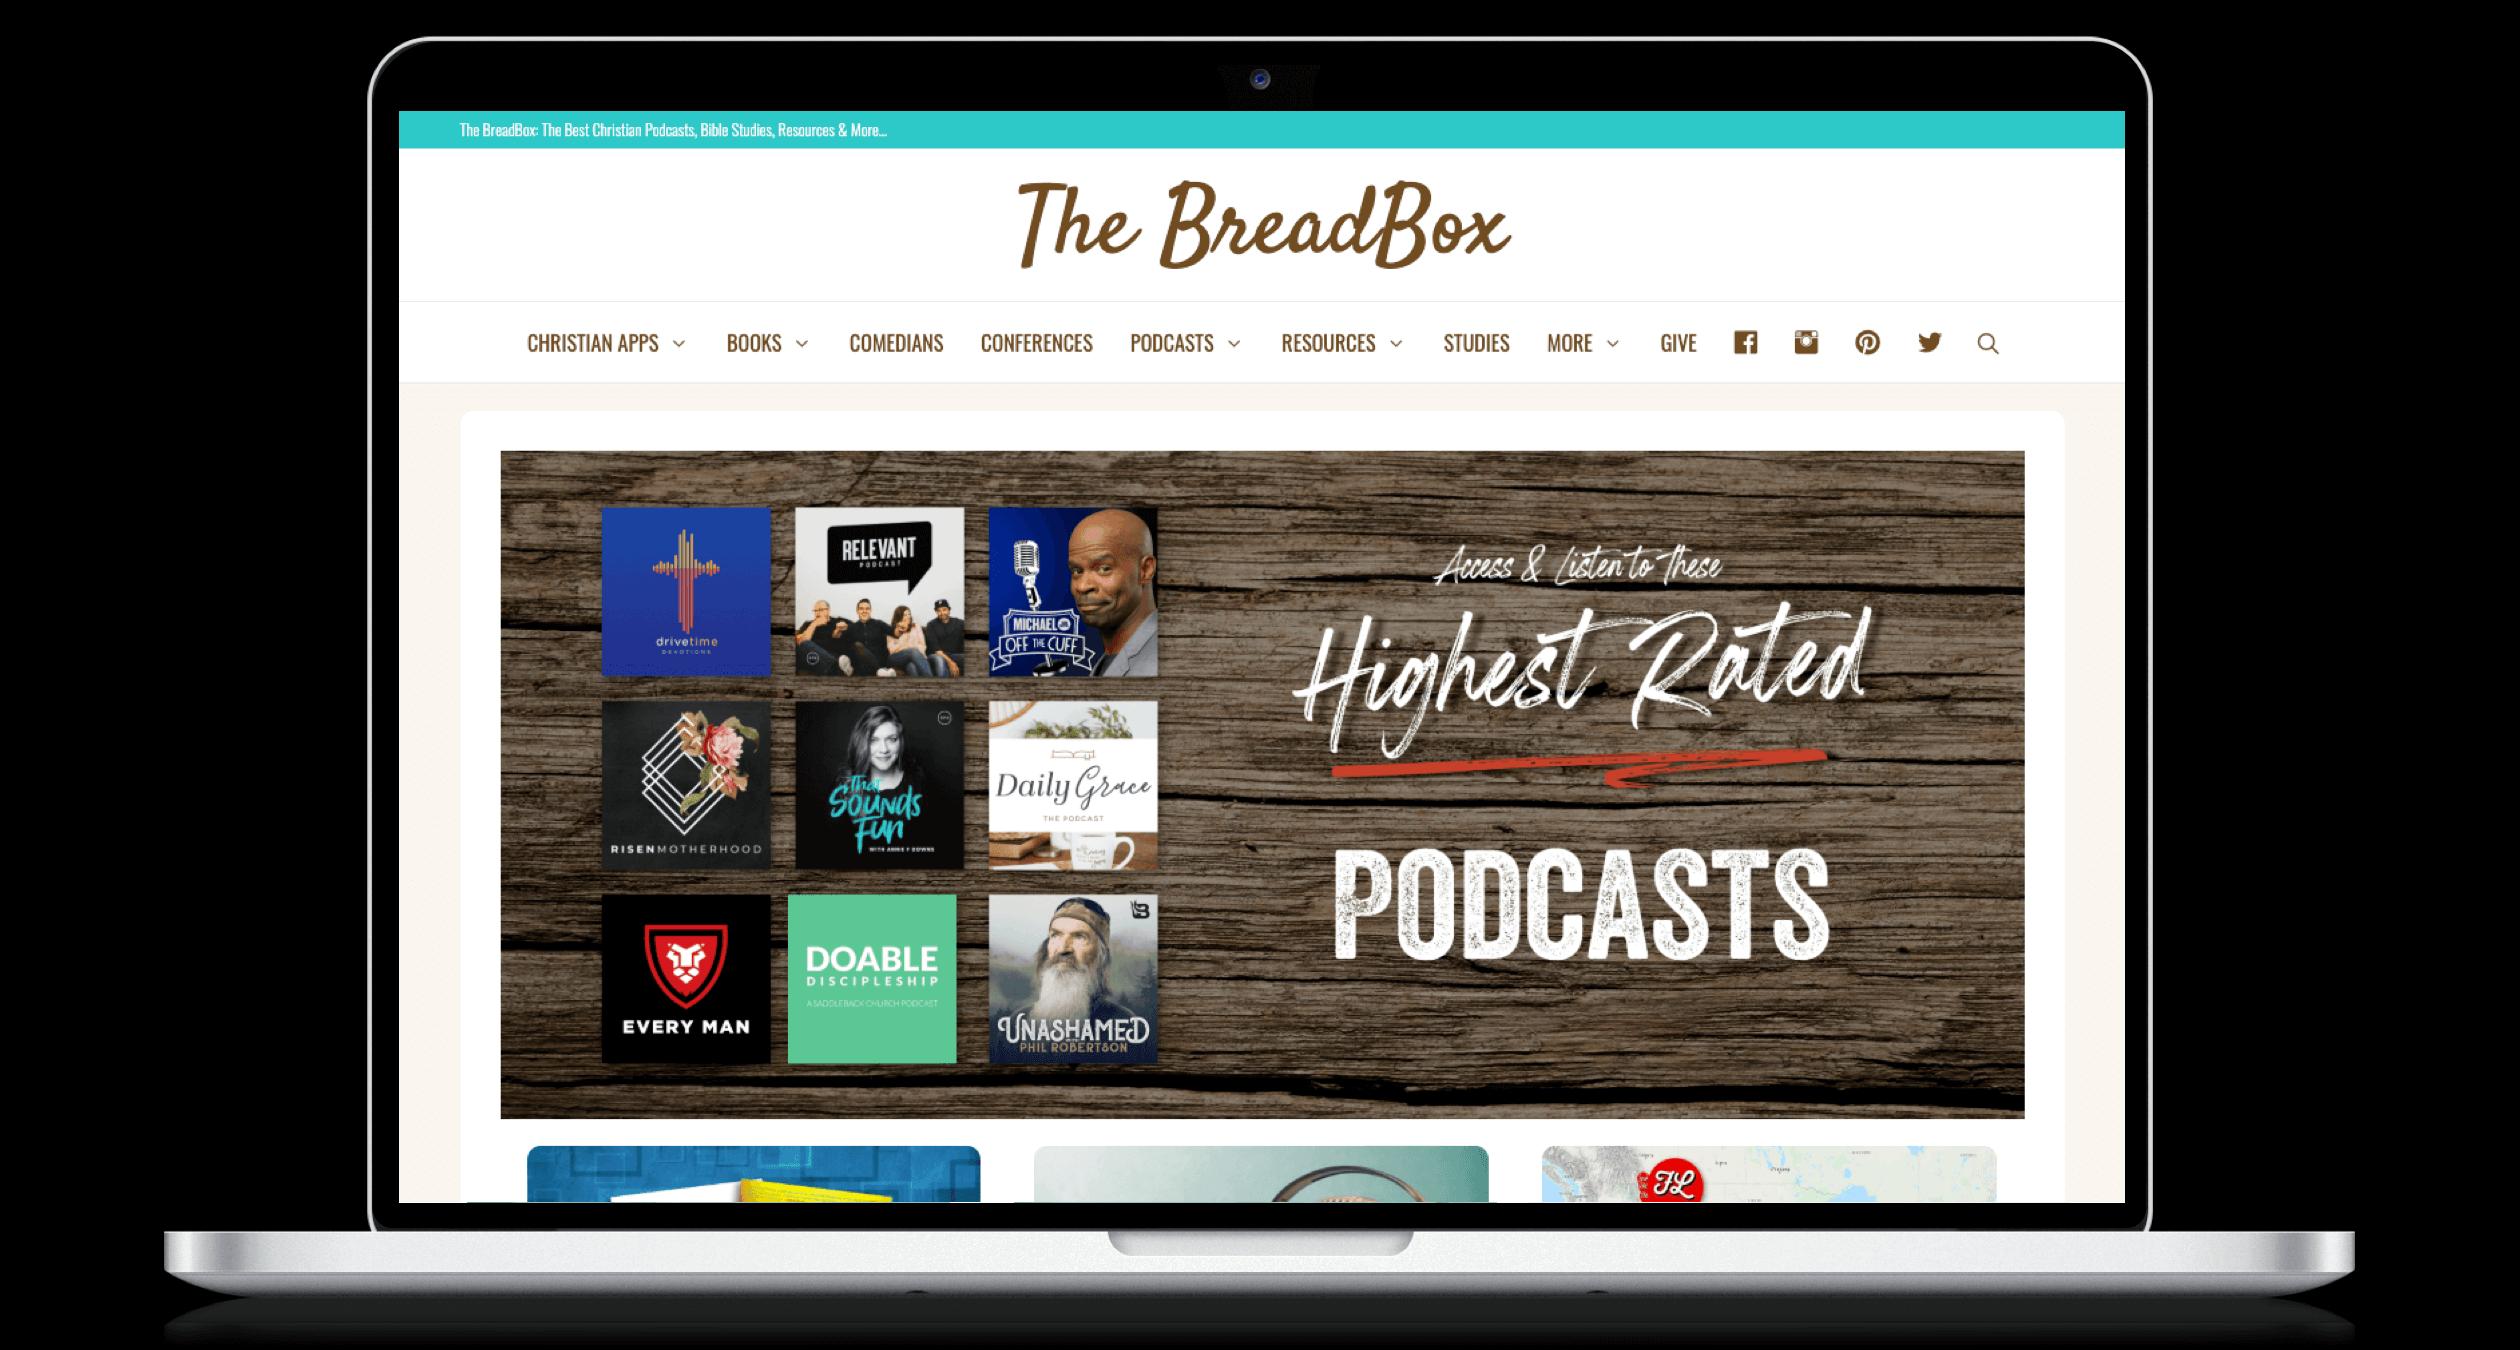 Christian-resources-podcasts-website-design-02